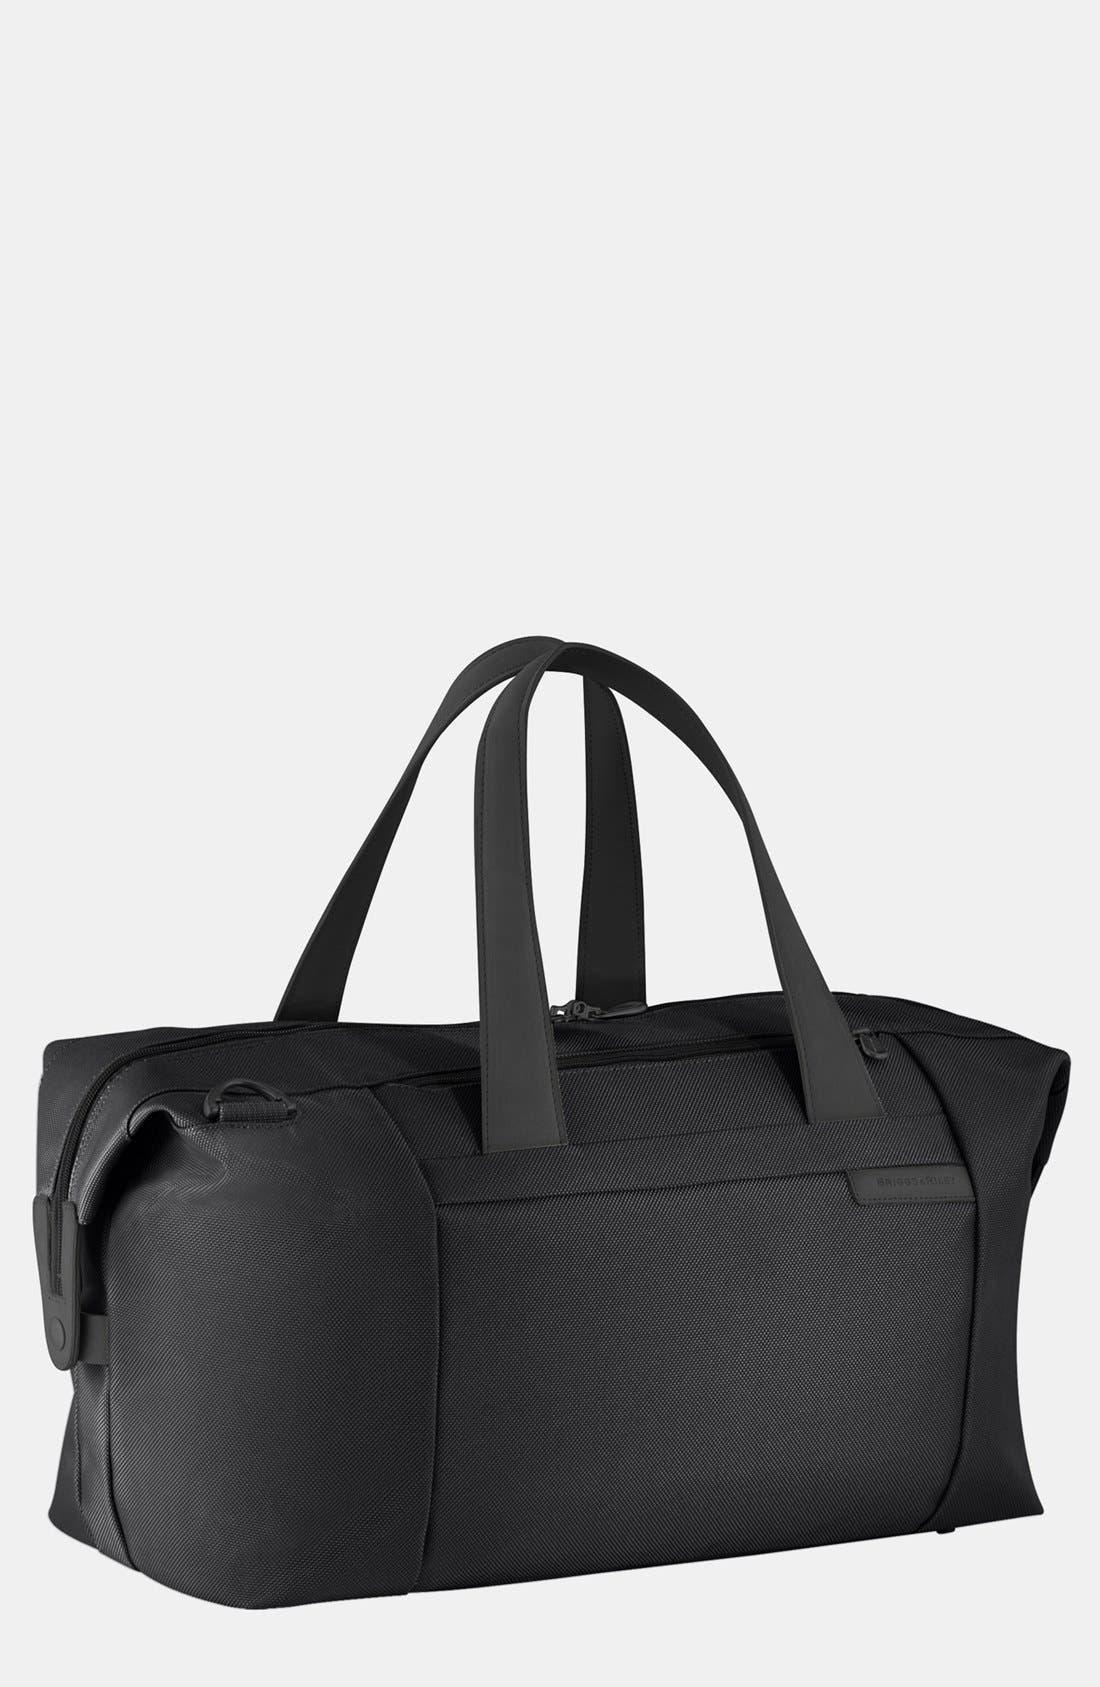 BRIGGS & RILEY Baseline Duffel Bag